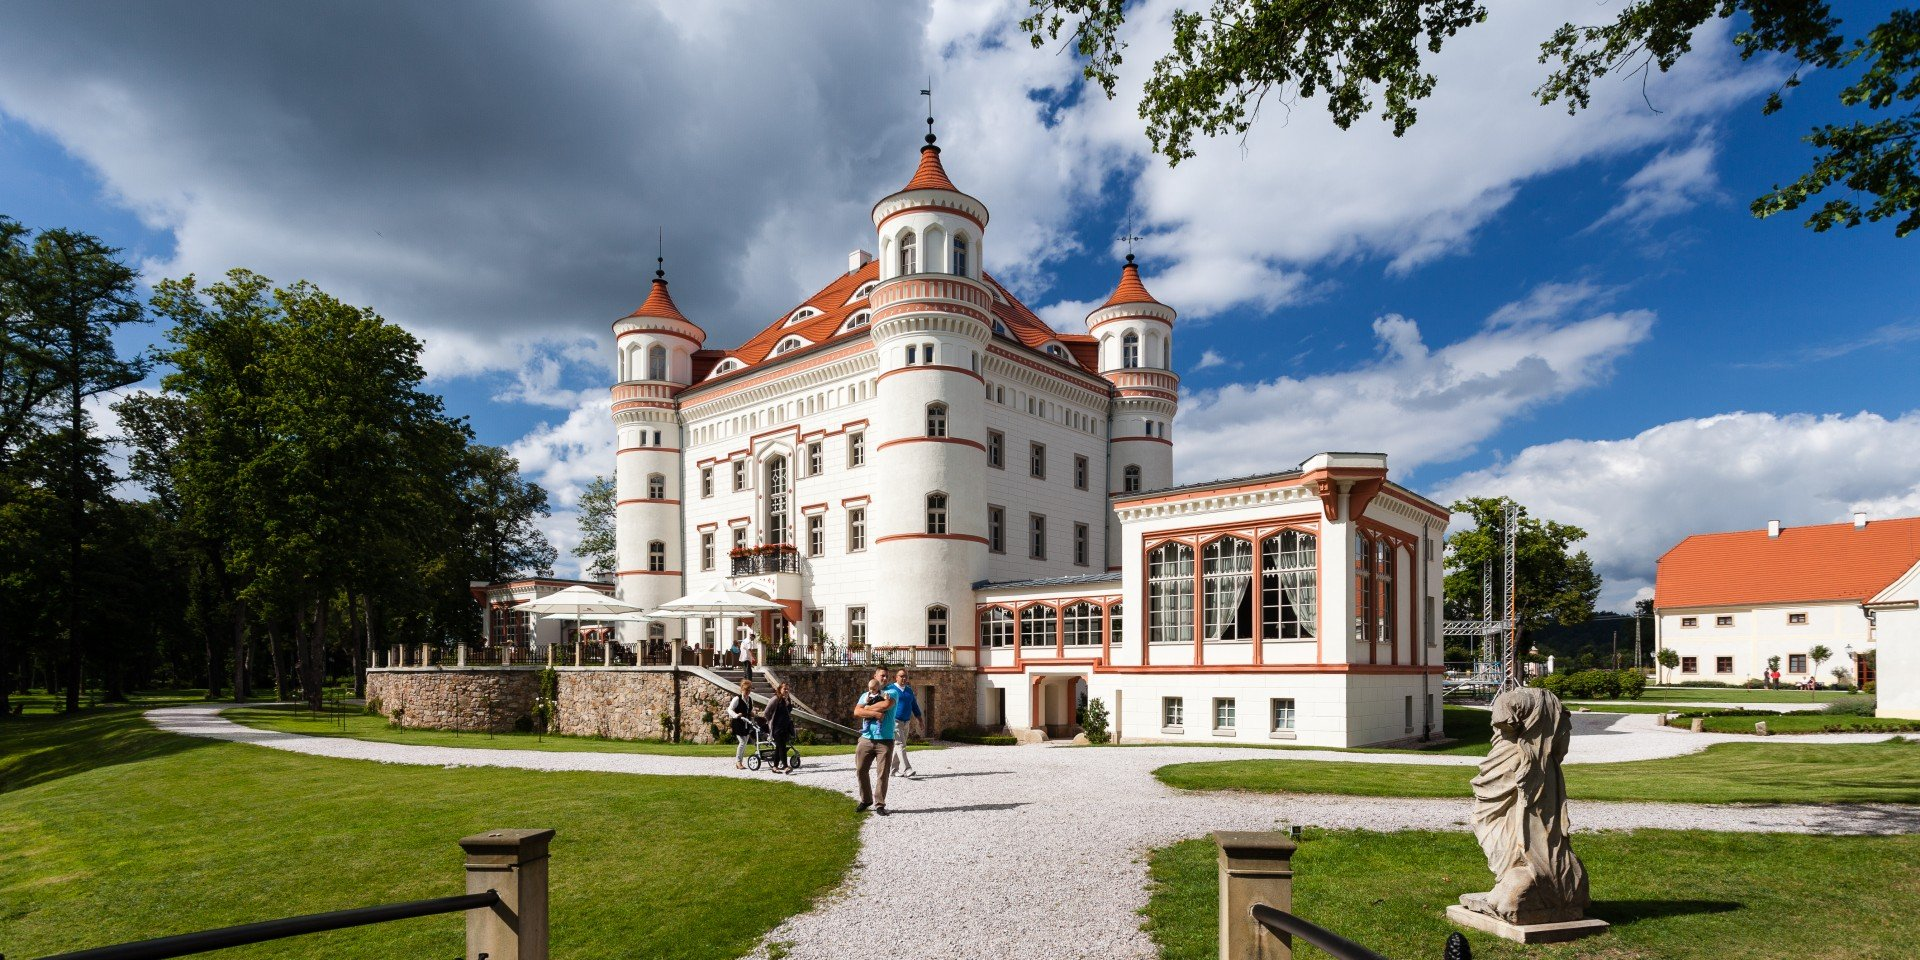 The Valley of Palaces and Gardens (Dolina Pałaców i Ogrodów)